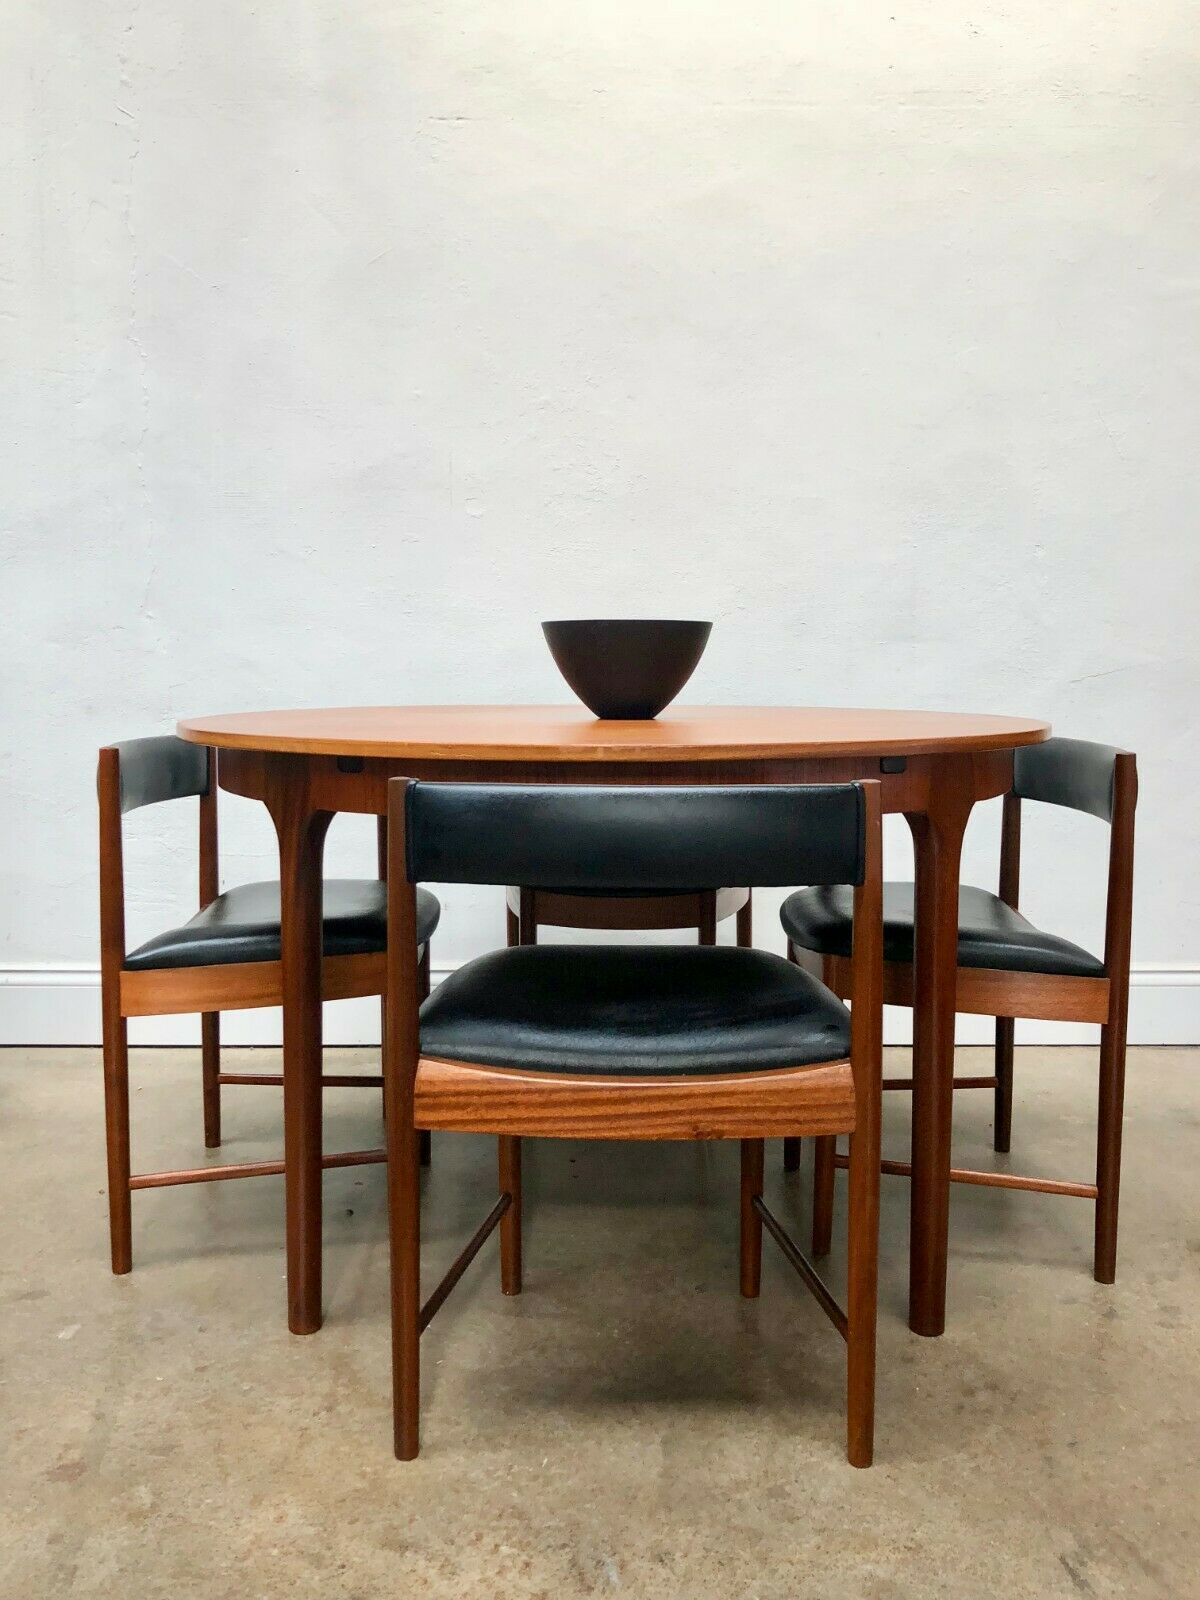 Vintage Mcintosh Dining Table 4 Chairs Danish G Plan Retro Hans